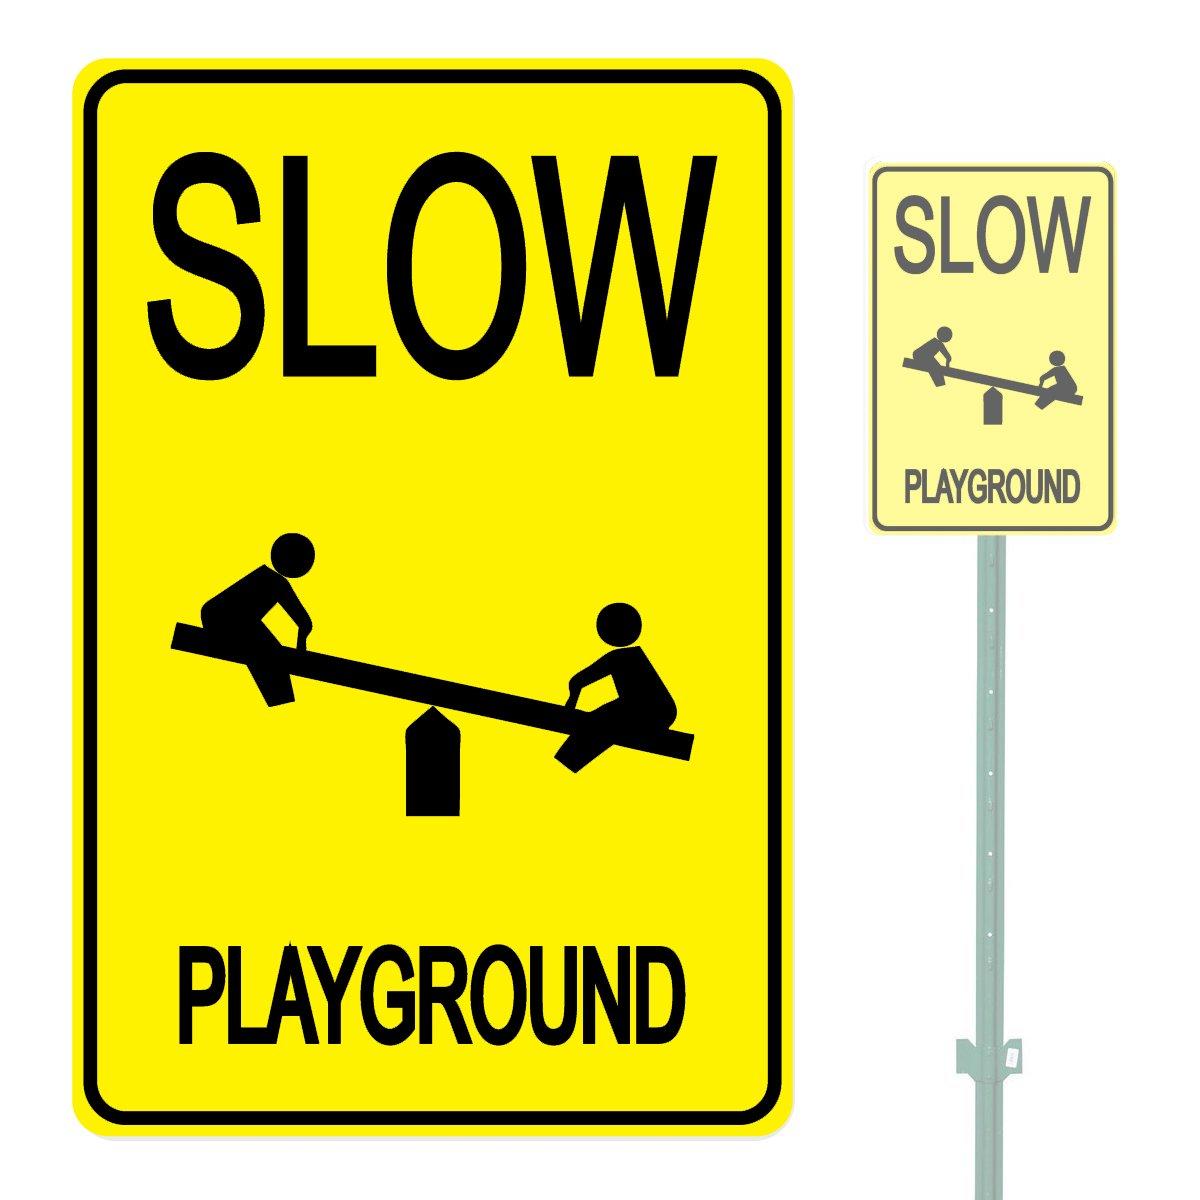 SLOW PLAYGROUND HEAVY DUTY ALUMINUM SIGN 10'' x 15''